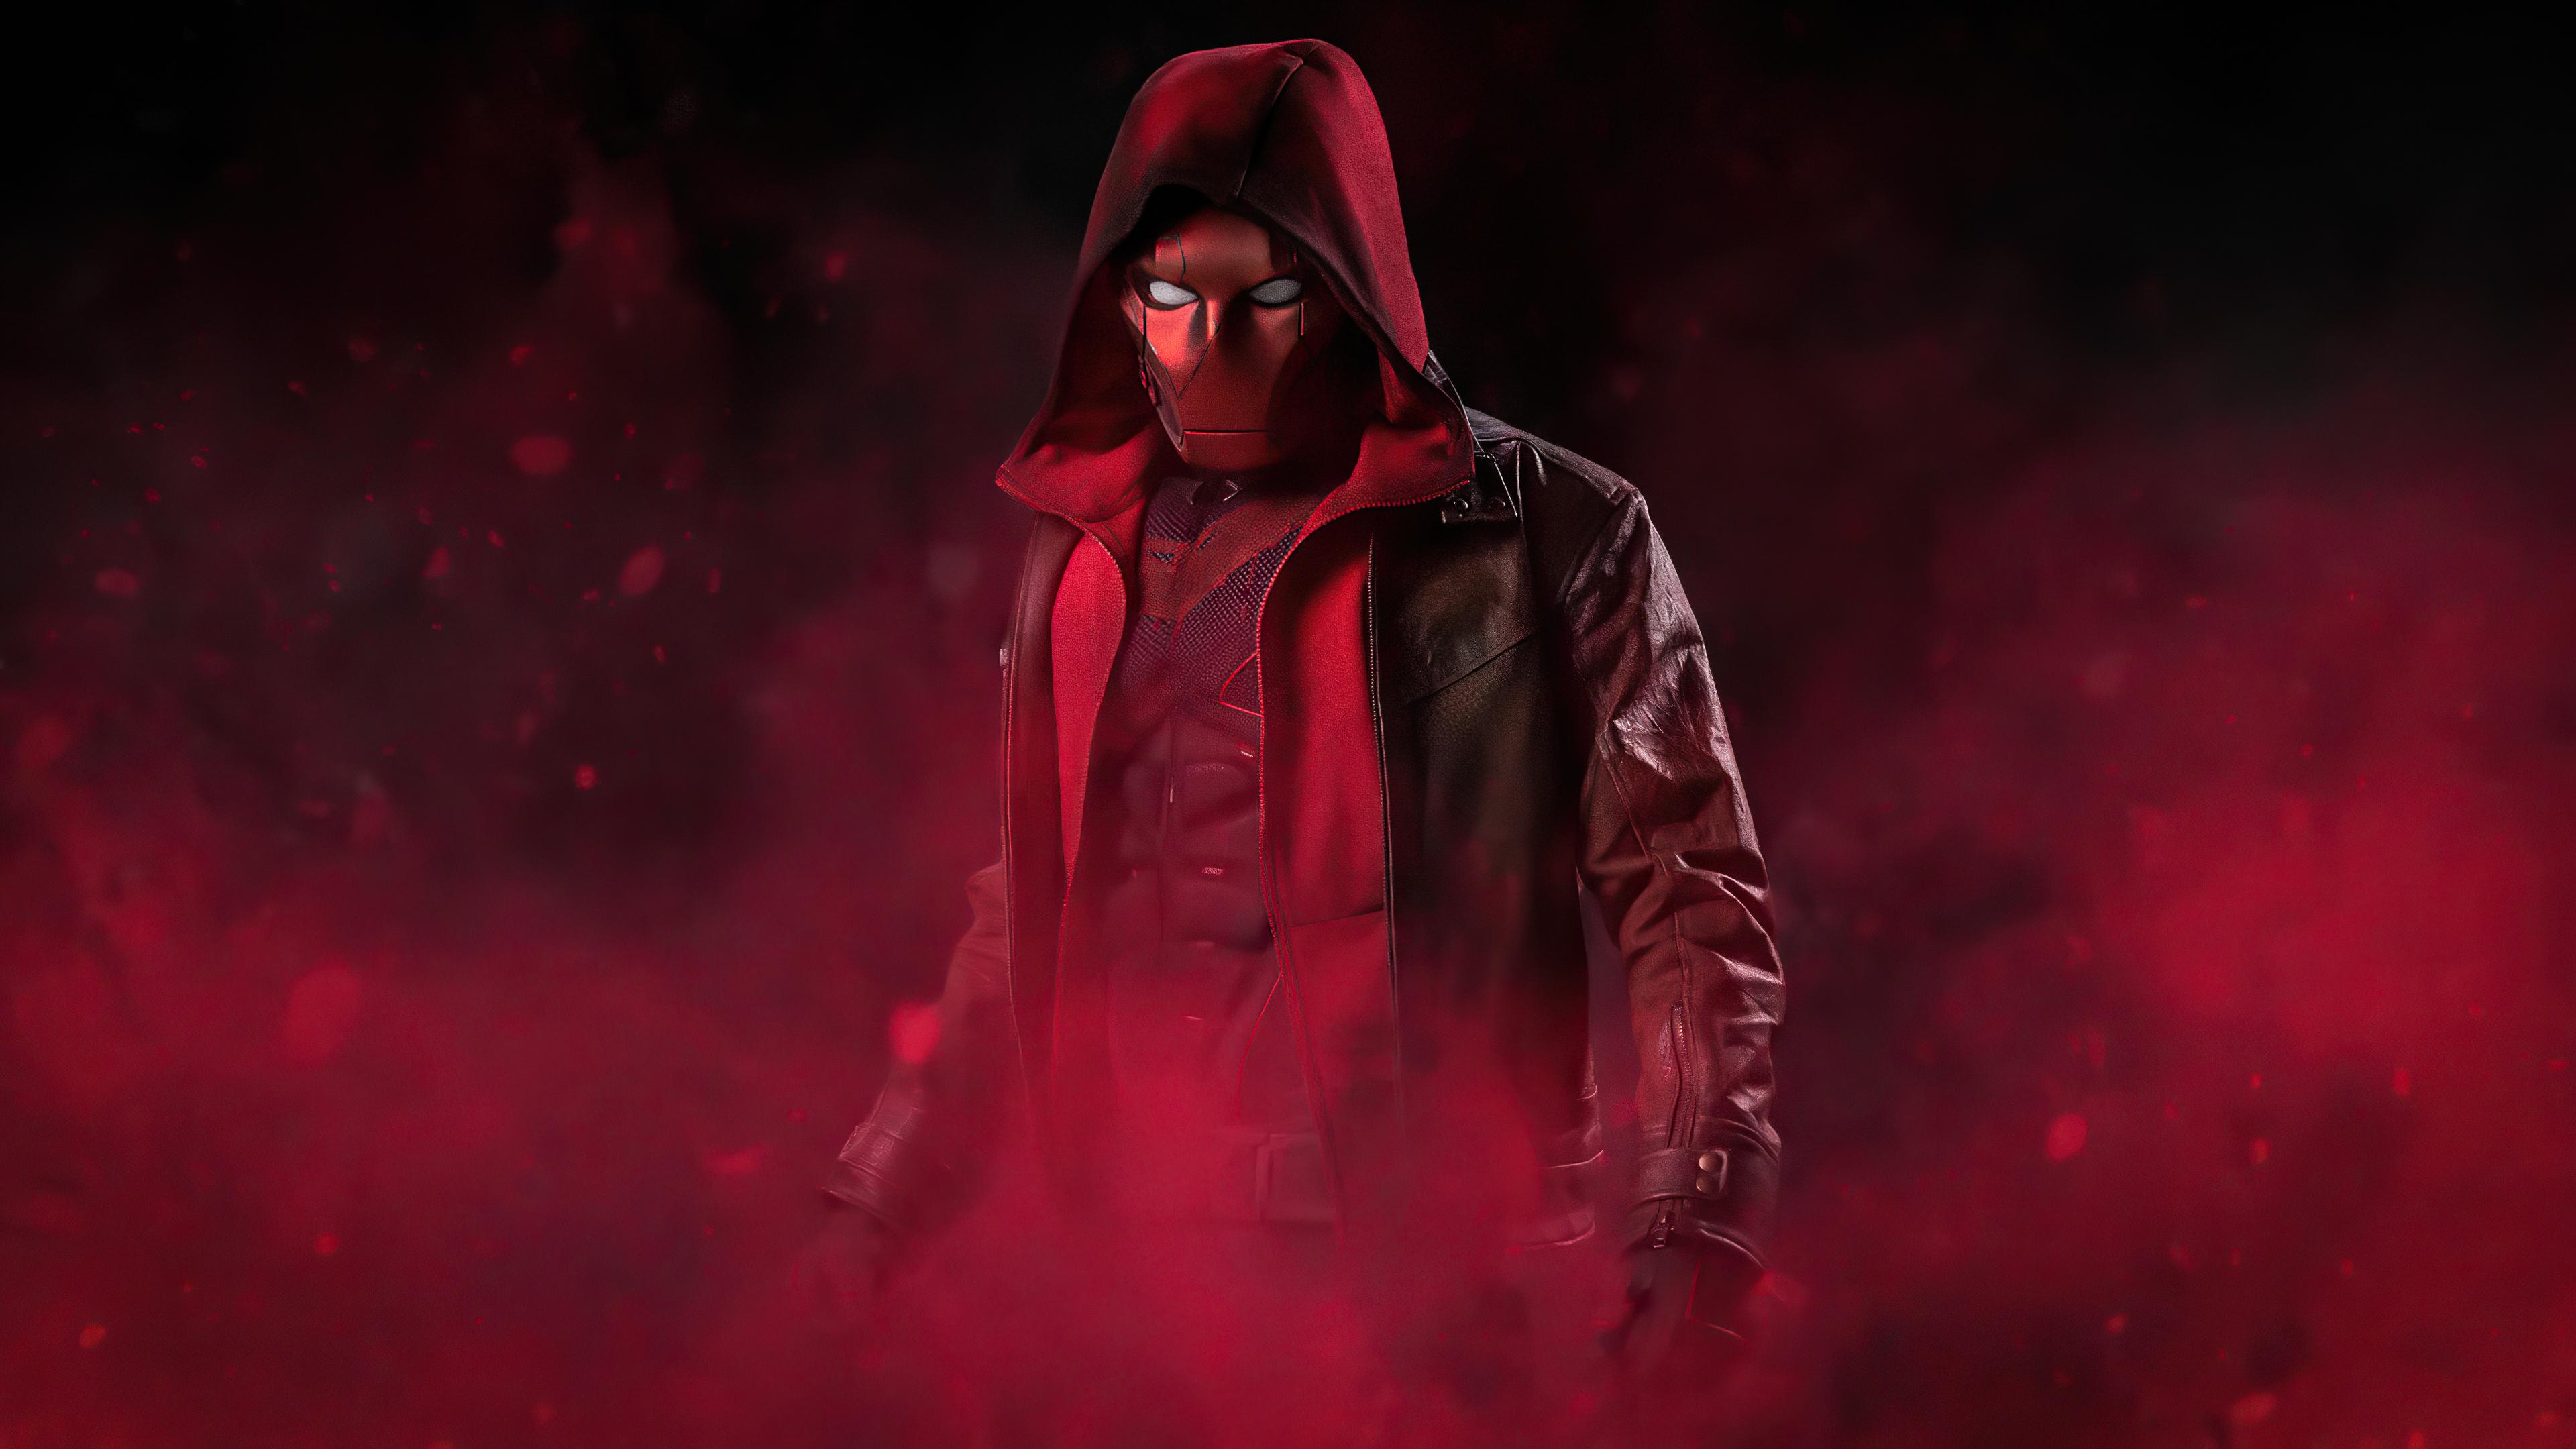 red hood in titans season 3 4k 1615200906 - Red Hood In Titans Season 3 4k - Red Hood In Titans Season 3 4k wallpapers